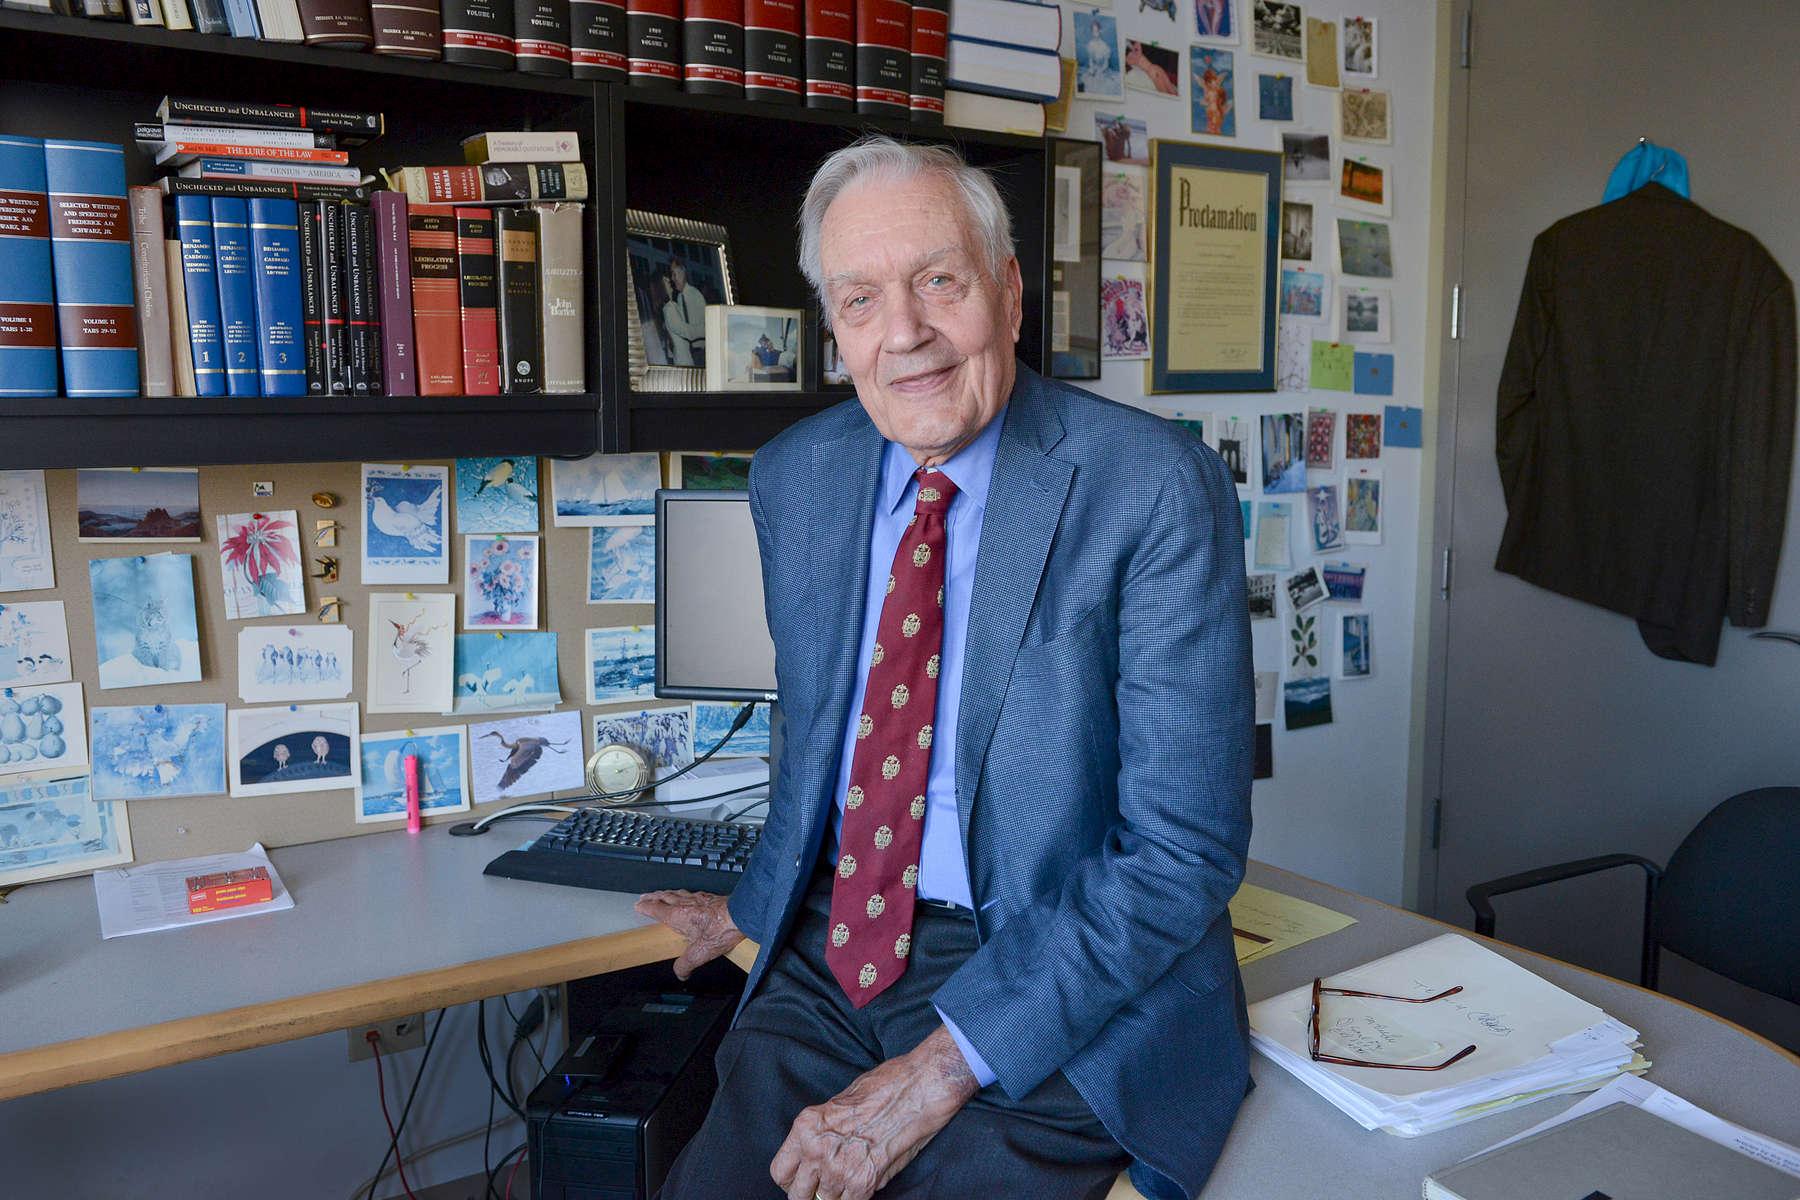 Frederick A.O. Schwarz Jr. - Brennan Center for Justice